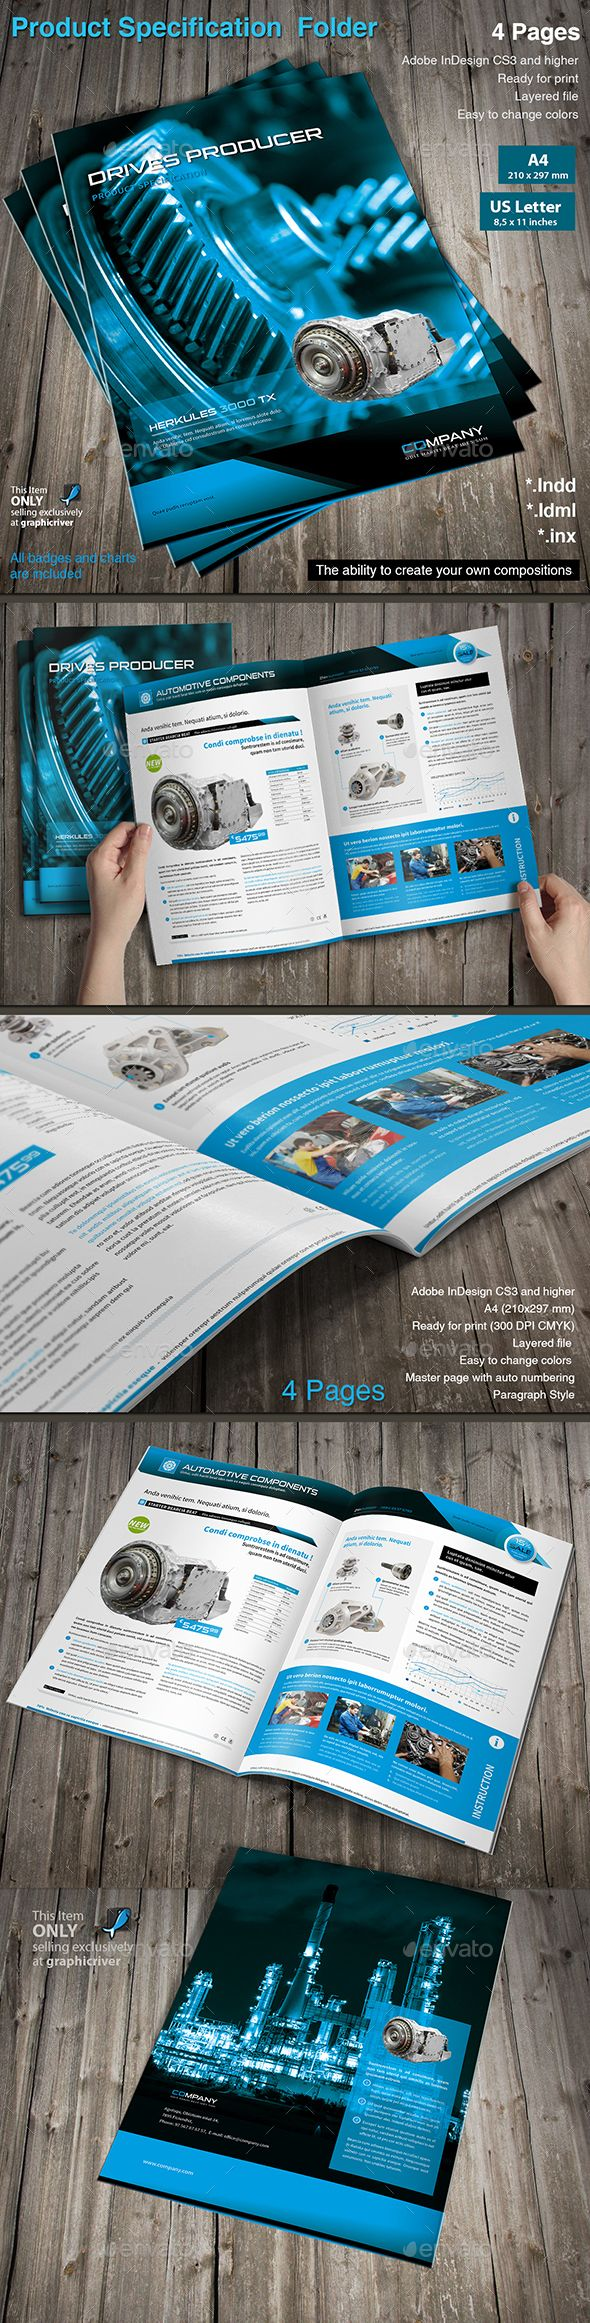 Product Specification Folder Template InDesign INDD #design Download: http://graphicriver.net/item/product-specification-folder-vol3/13978066?ref=ksioks